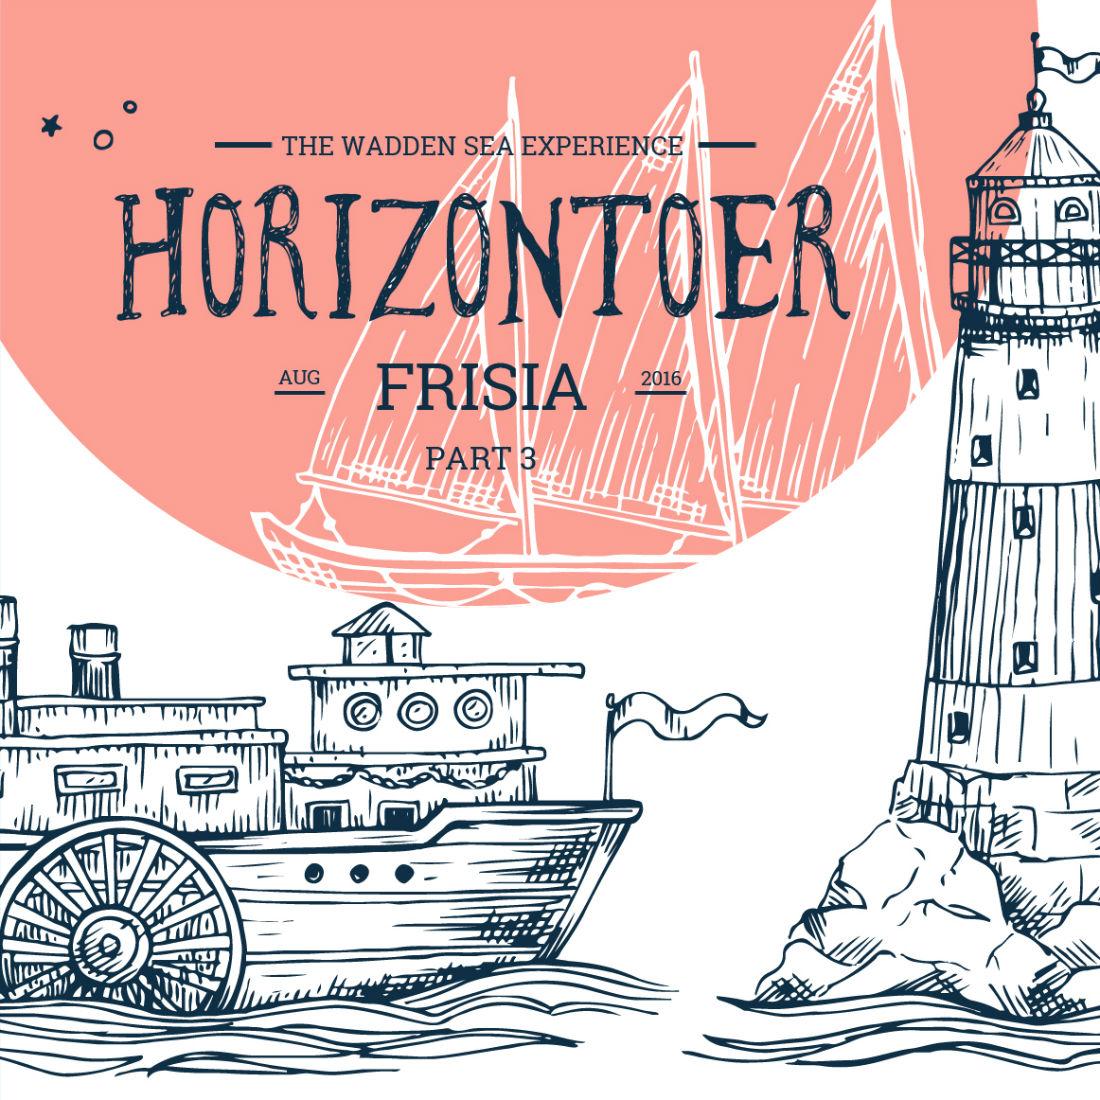 Horizontoer Festival (c) Lomoherz